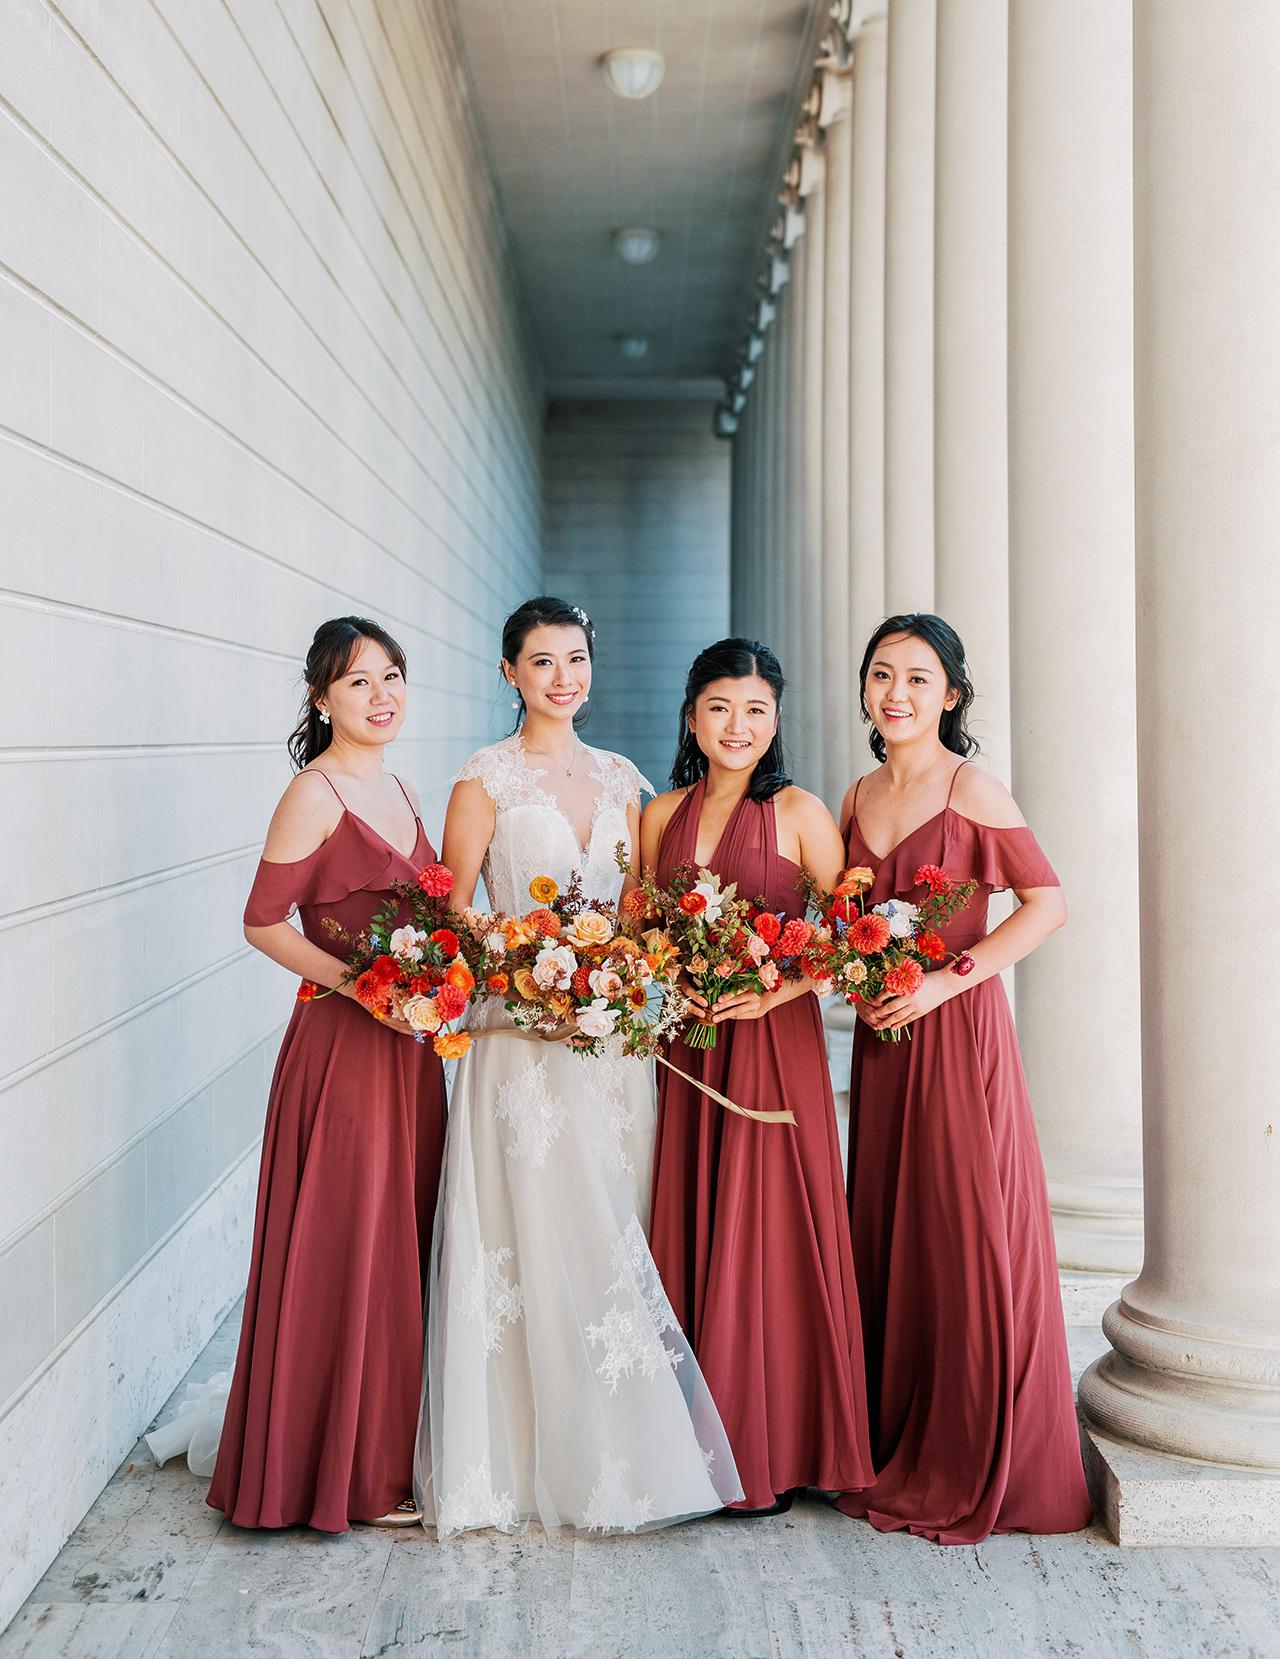 bride posing with bridesmaids cinnamon rose dresses